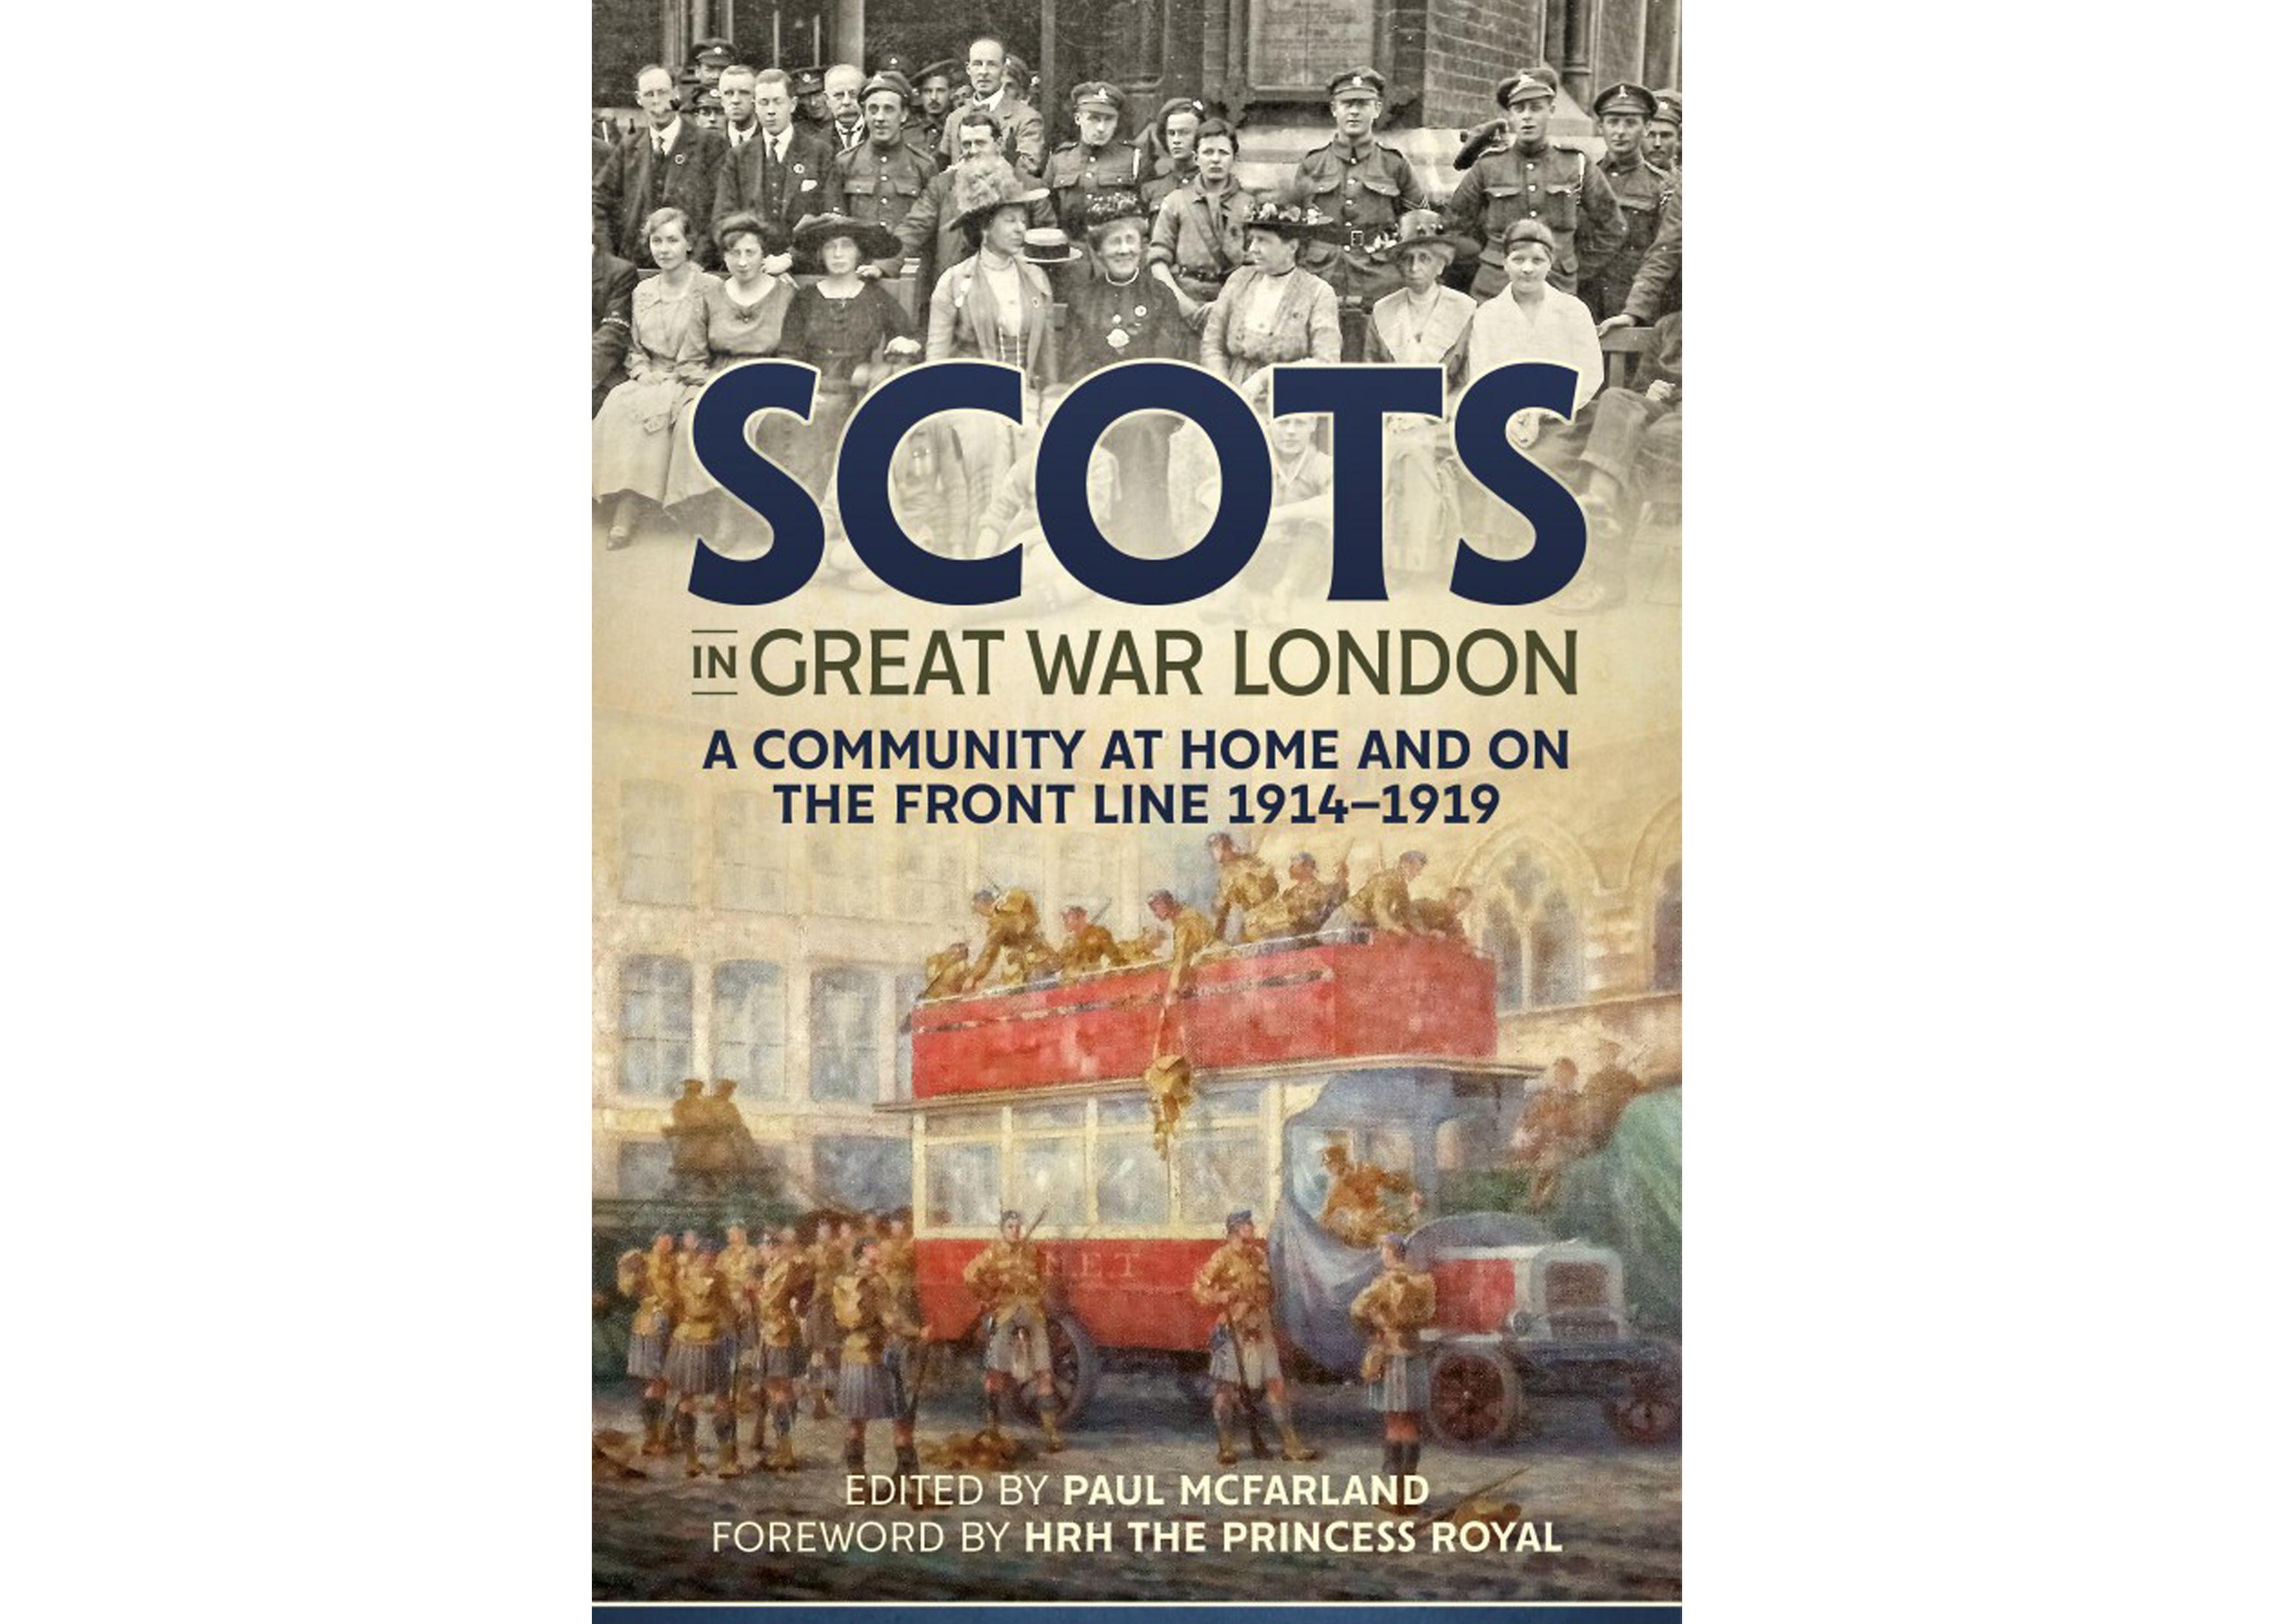 26 June: Commemorative Book Launch